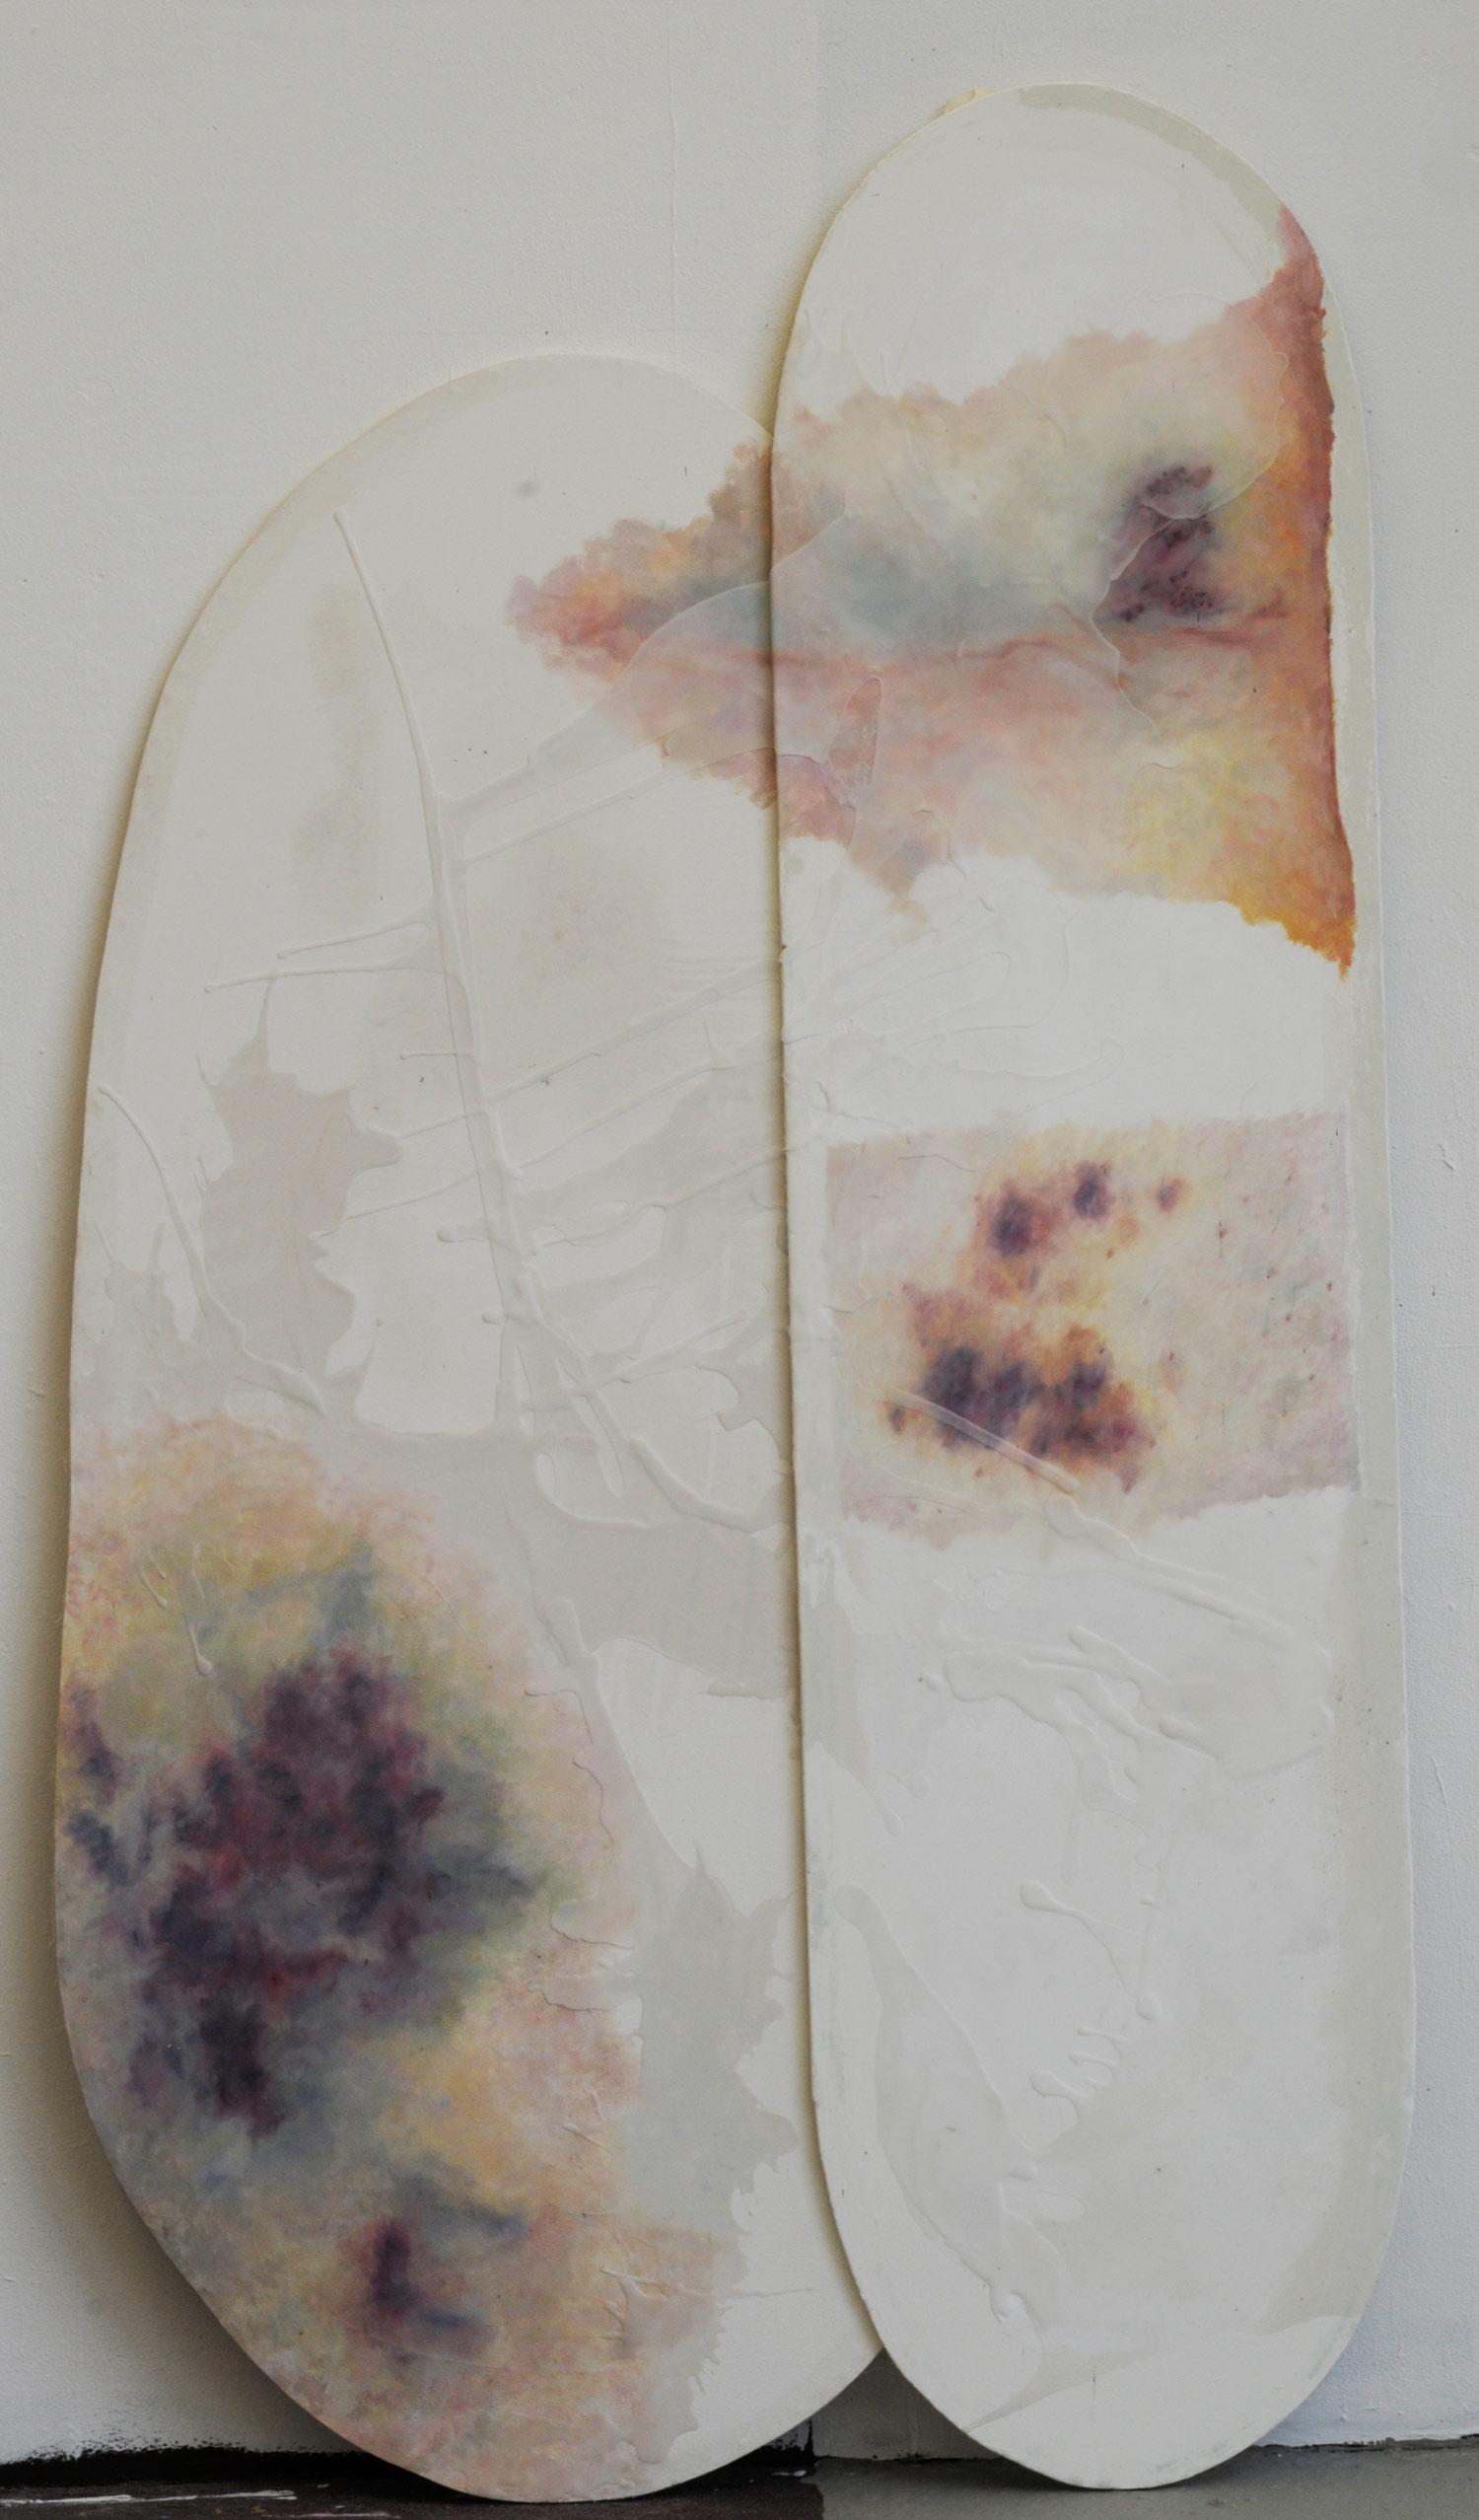 Laura Link . ohne Titel . 2013 . Öl auf Leinwand . 220 x 180